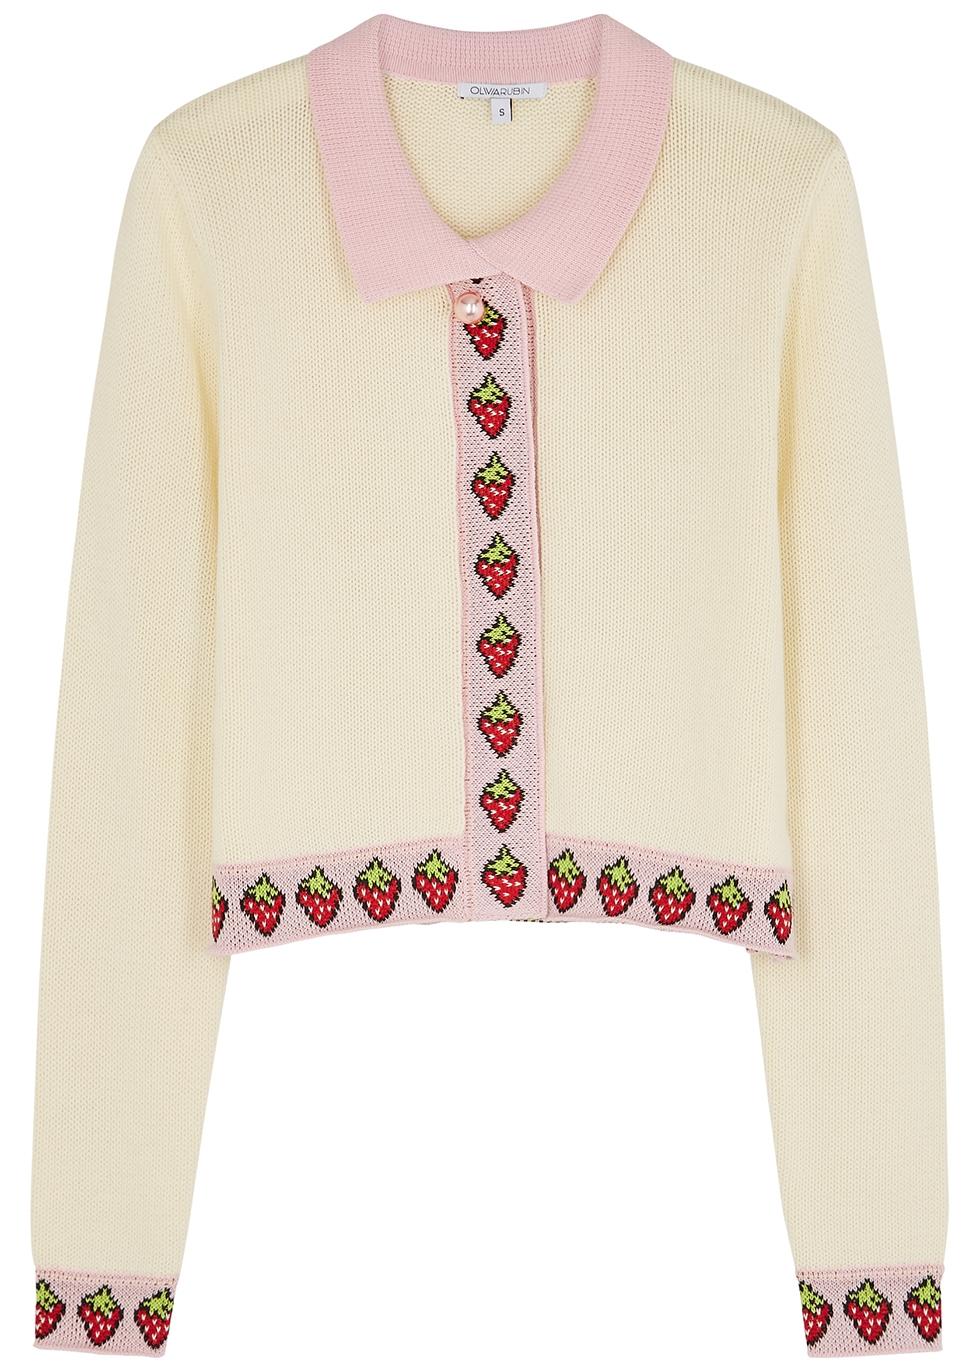 Bettina cream cotton cardigan